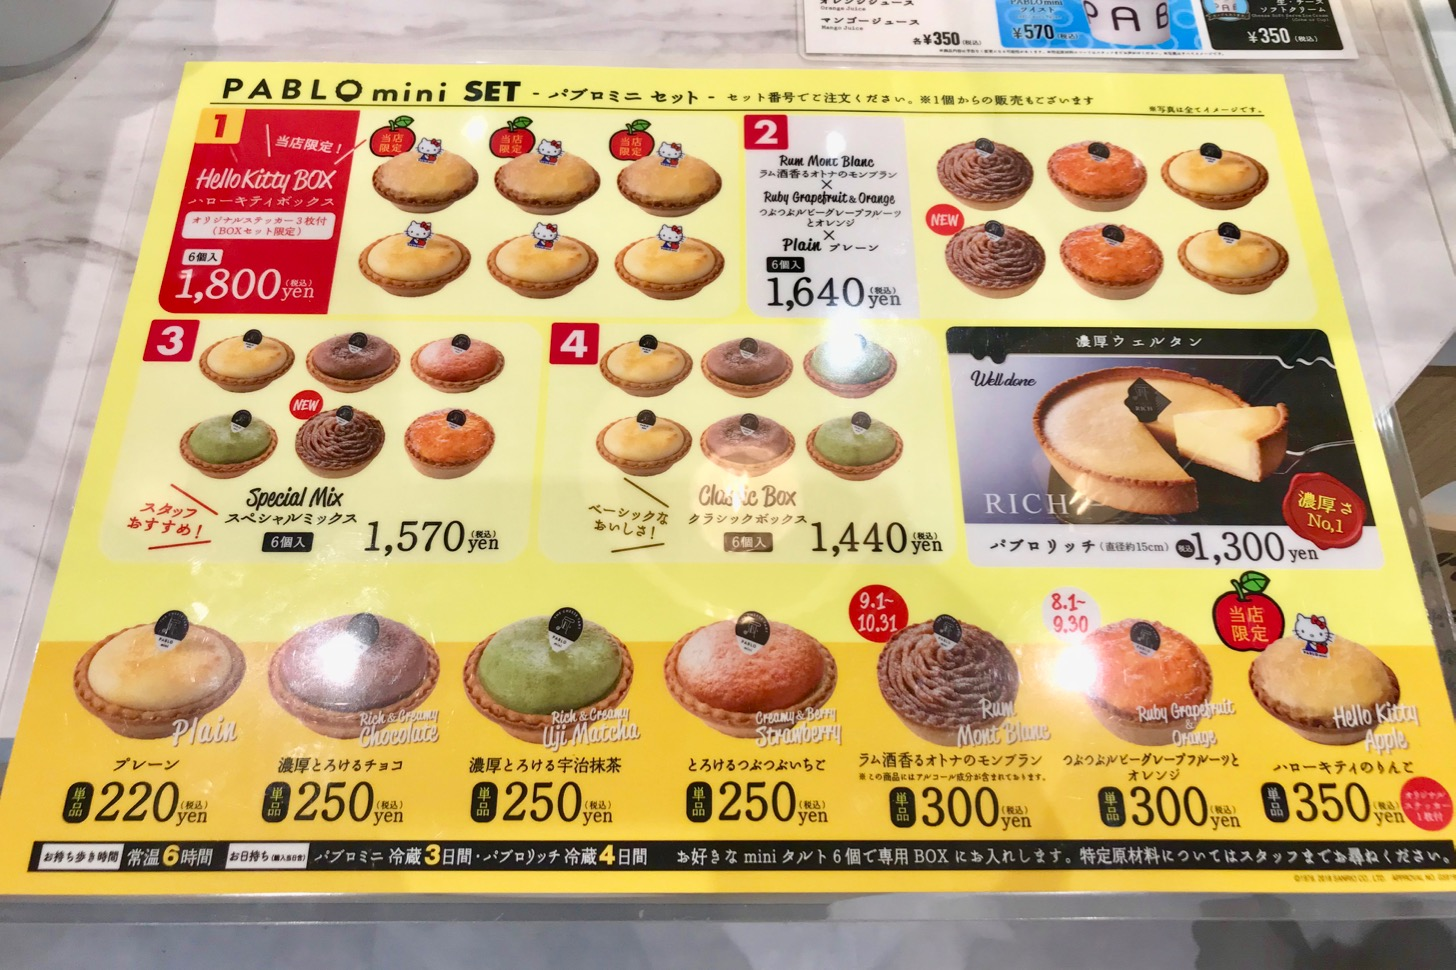 PABLO mini(パブロミニ)小田急多摩センター店のメニュー